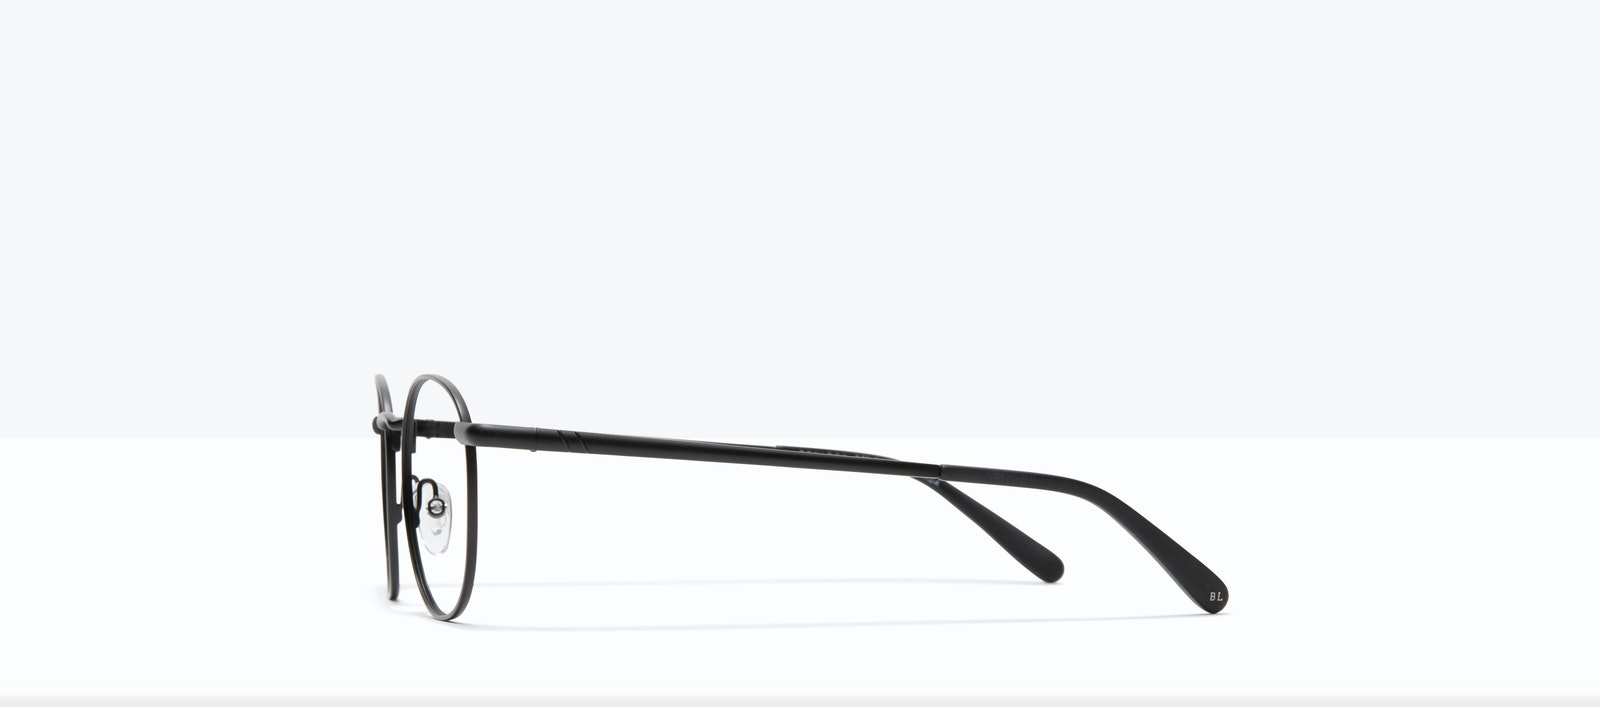 Affordable Fashion Glasses Round Eyeglasses Men Women Divine Matte Black Side